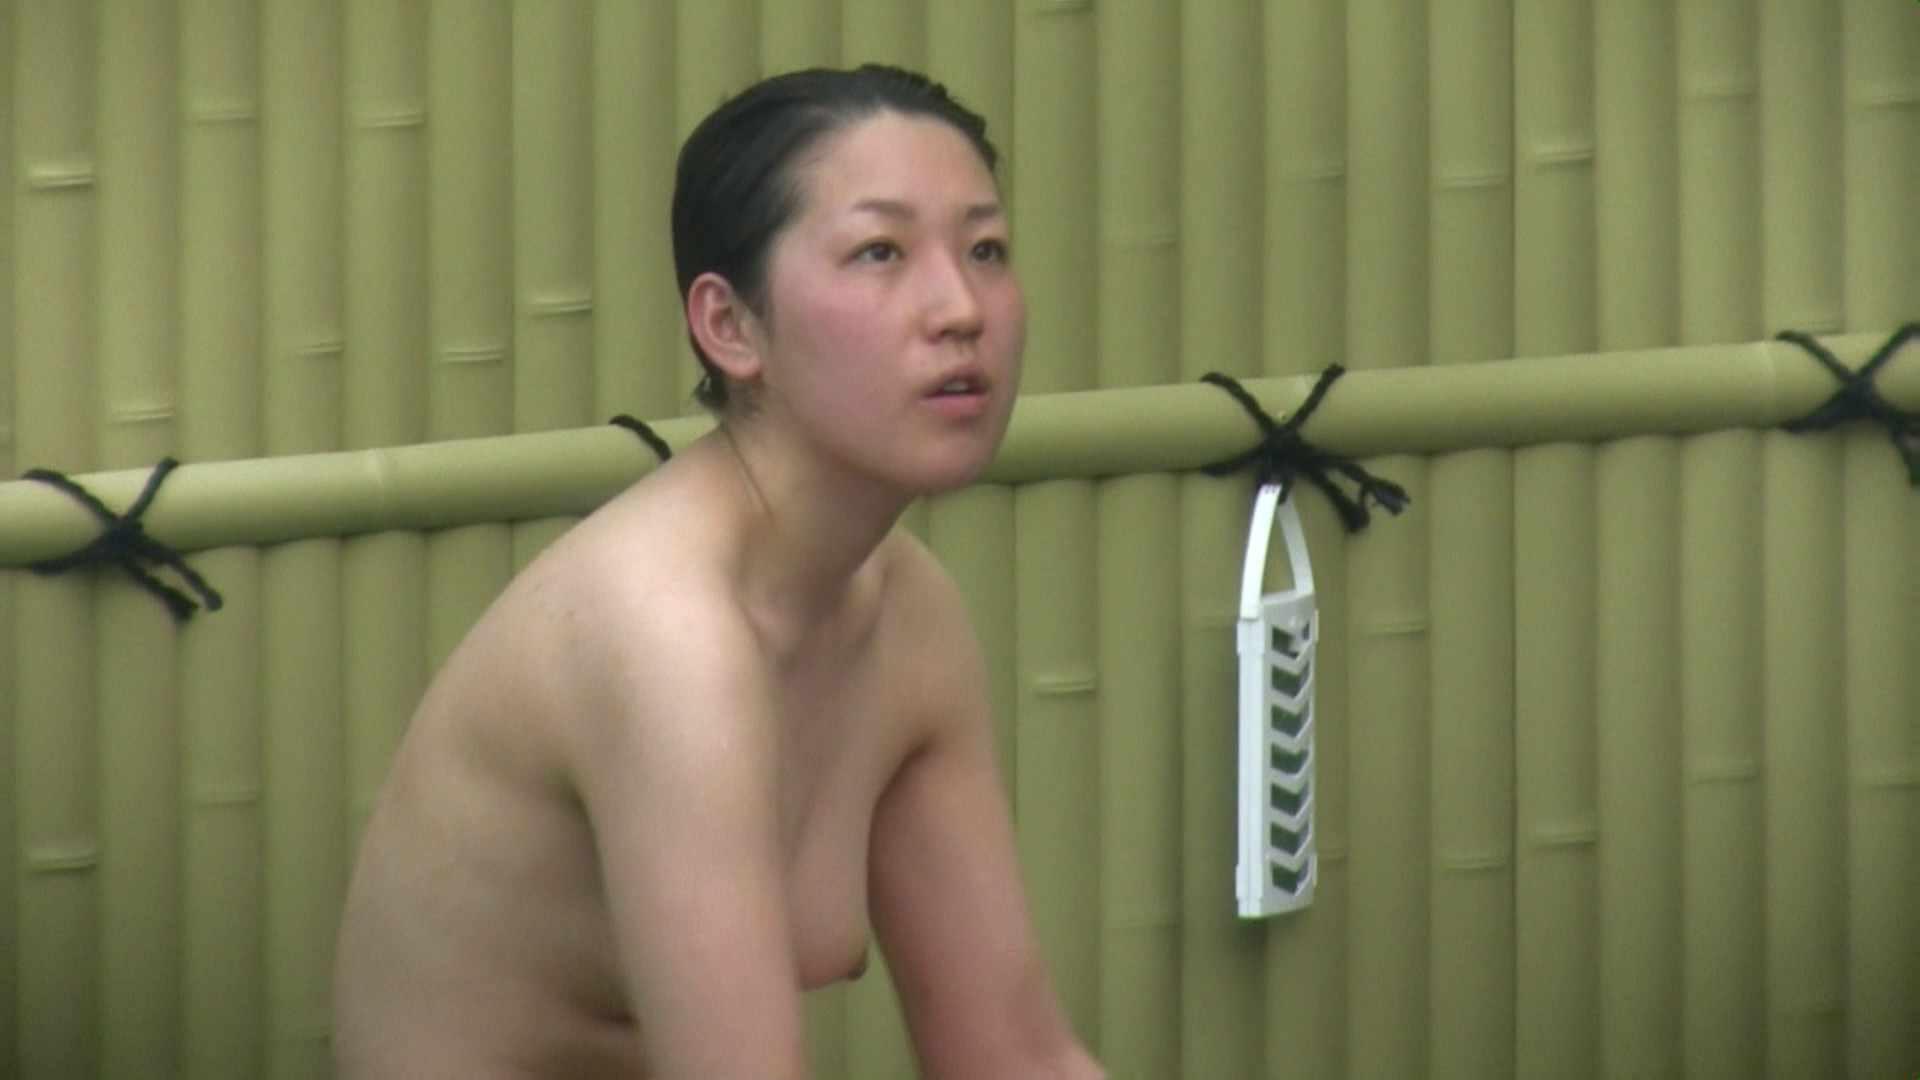 Aquaな露天風呂Vol.01 【VIP】 0 | 0  18連発 11